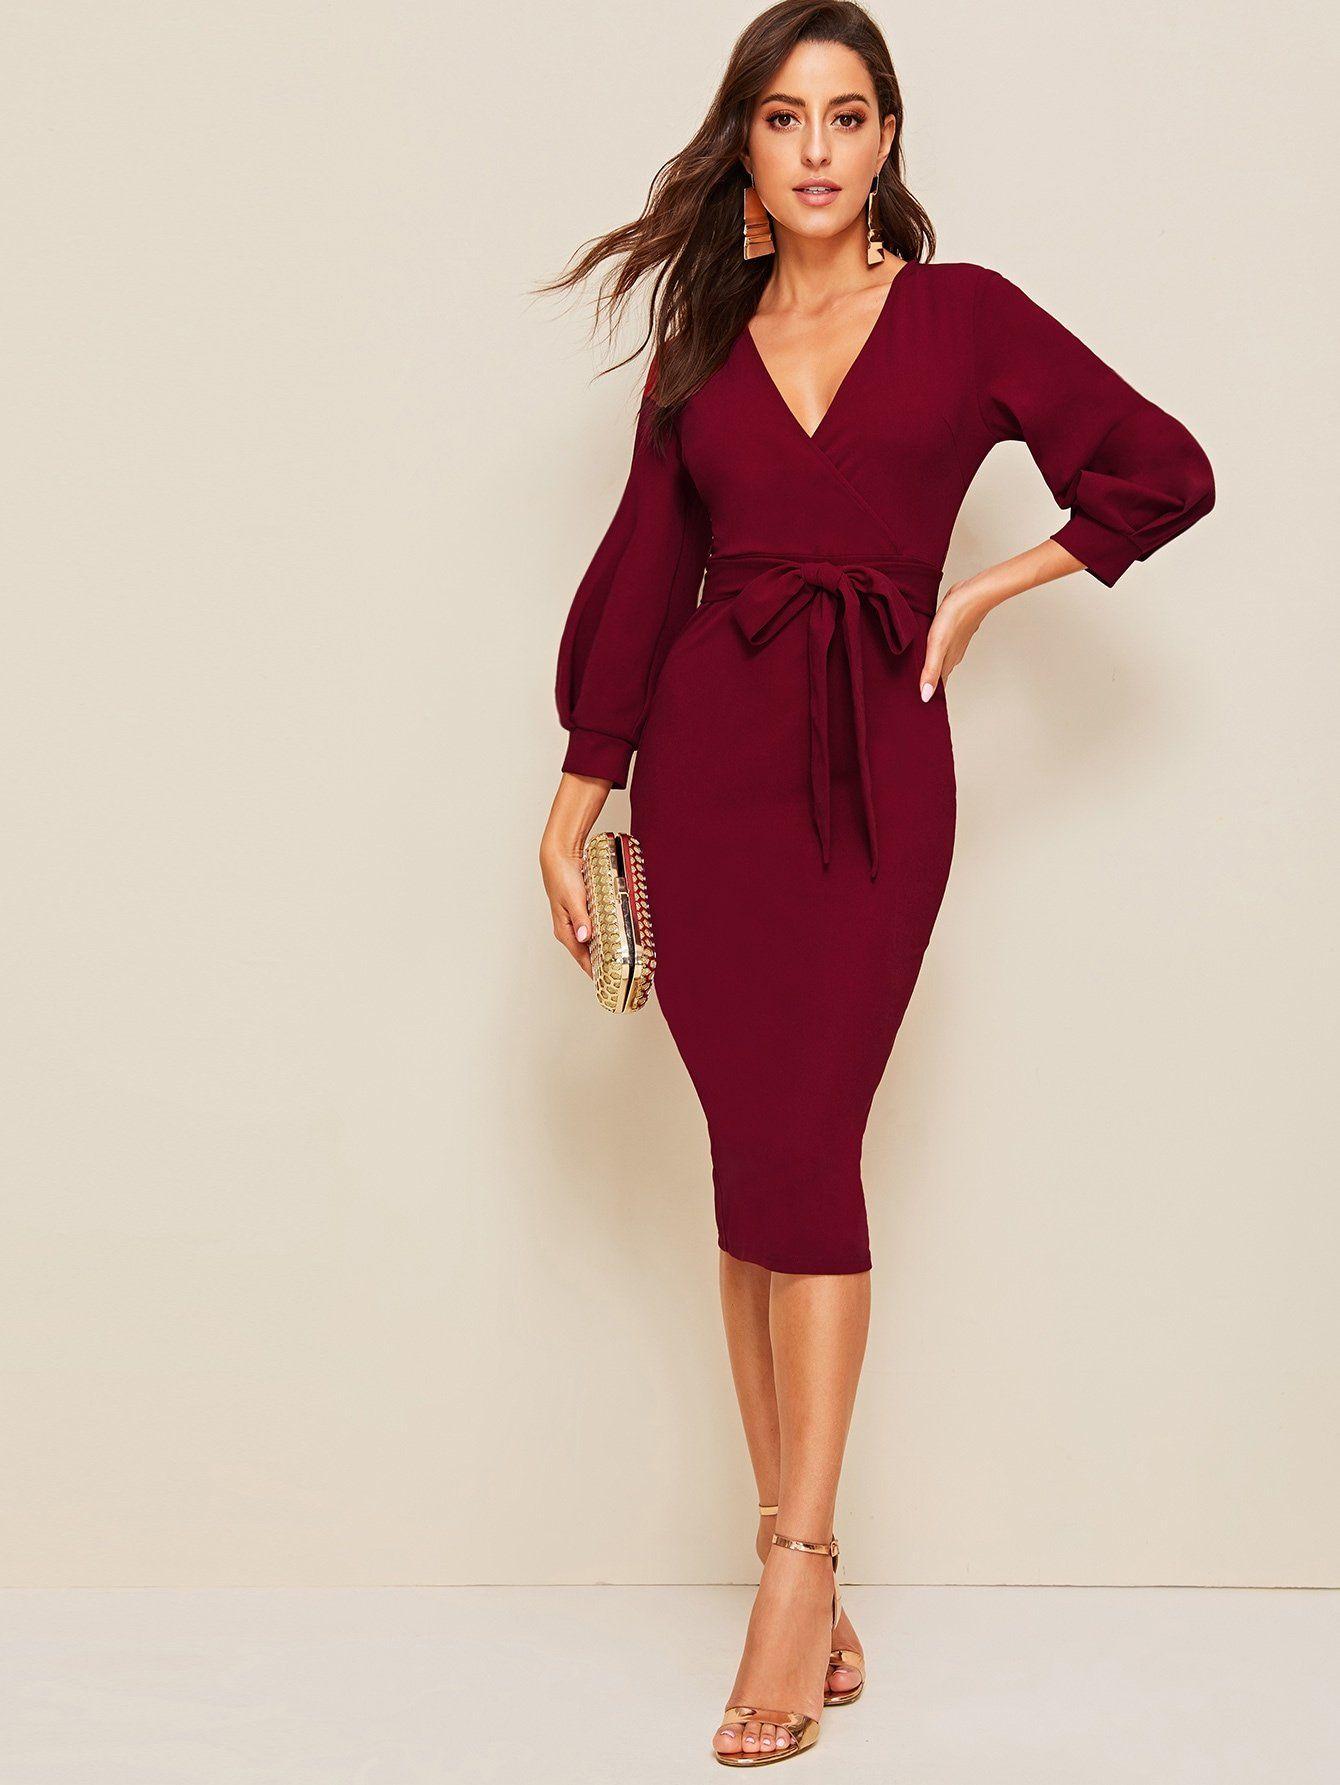 Burgundy Self Belted Split Hem Surplice Wrap Dress Cs110113 Surplice Wrap Dress Wrap Dress Belted Dress [ 1785 x 1340 Pixel ]